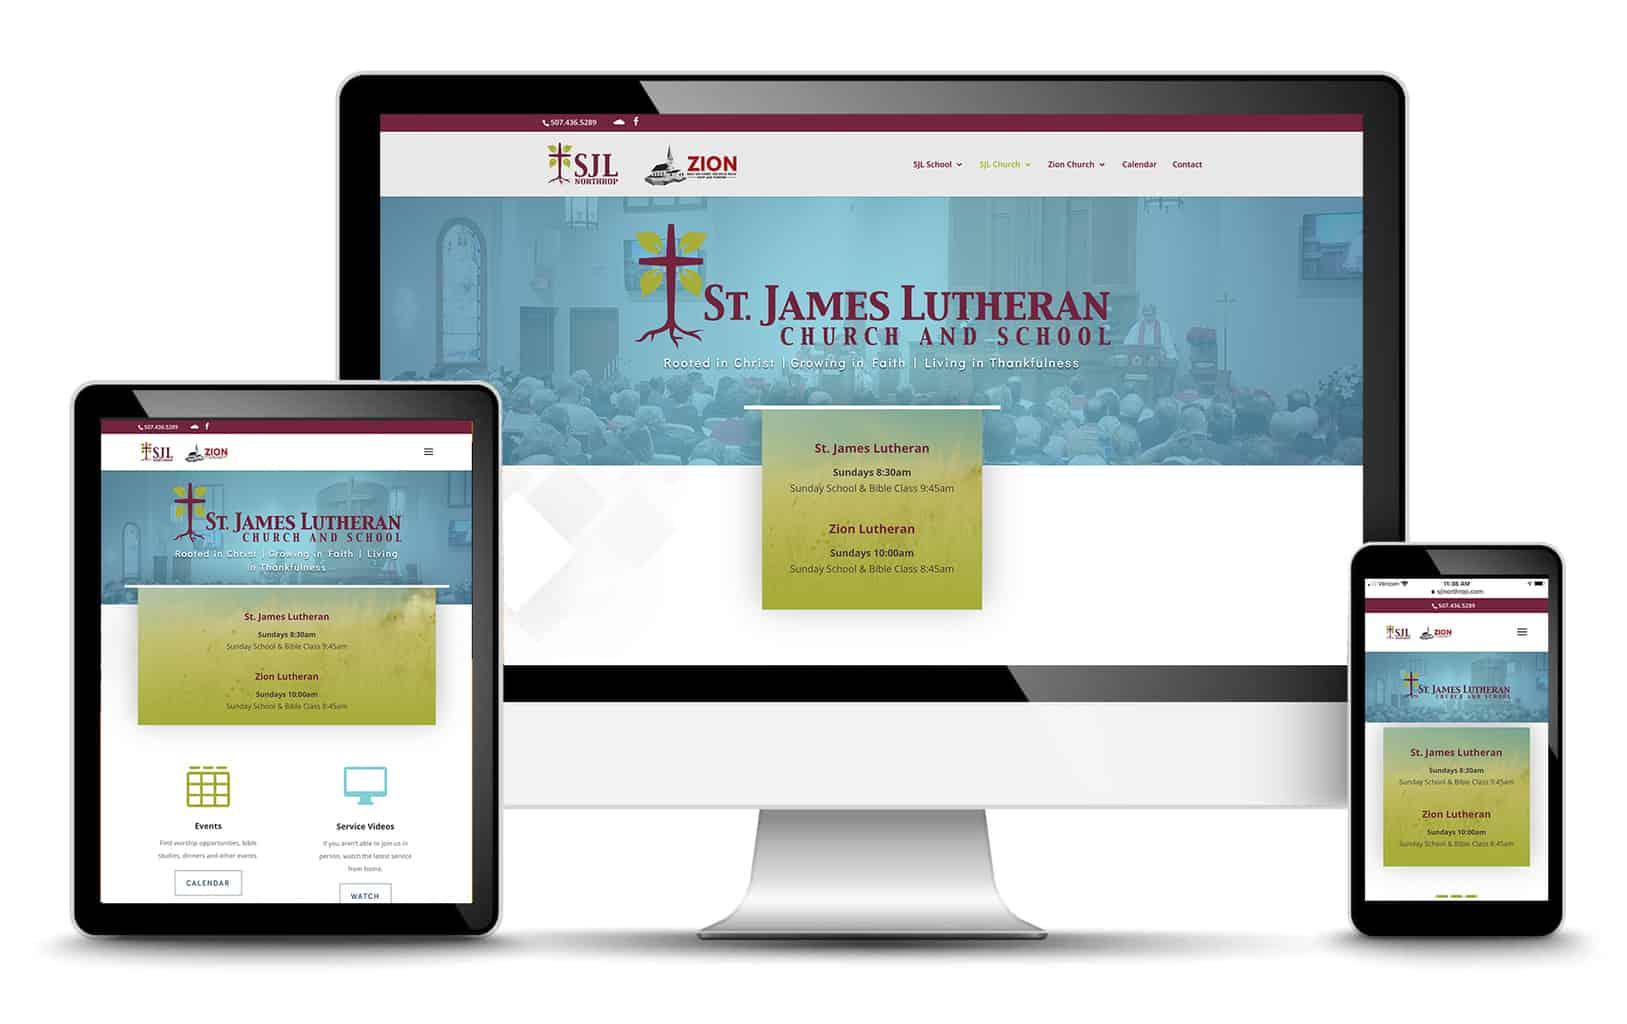 st. james lutheran website